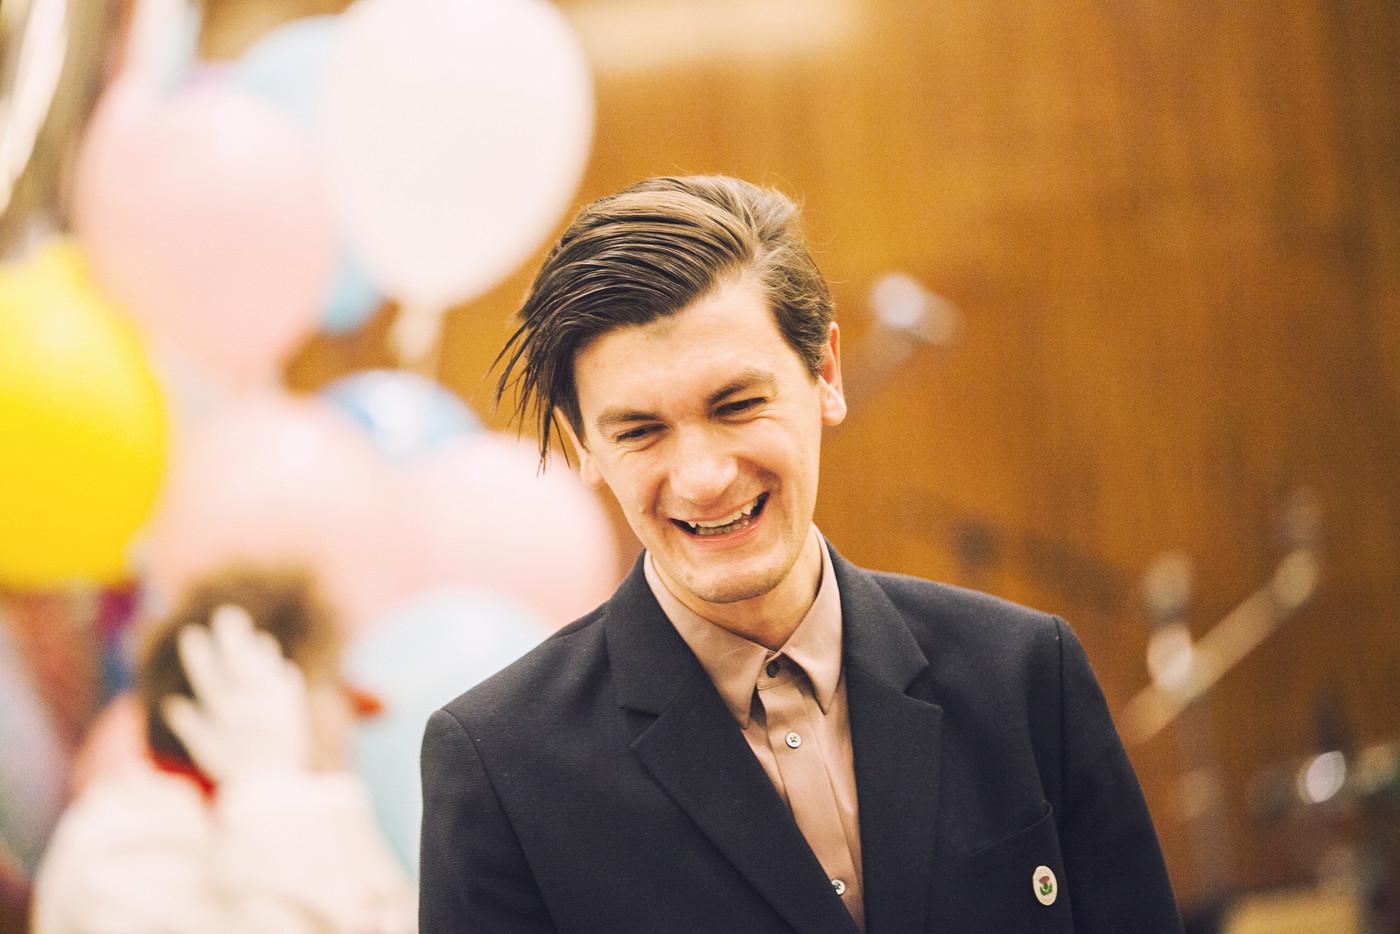 Личная жизнь Александра Гудкова